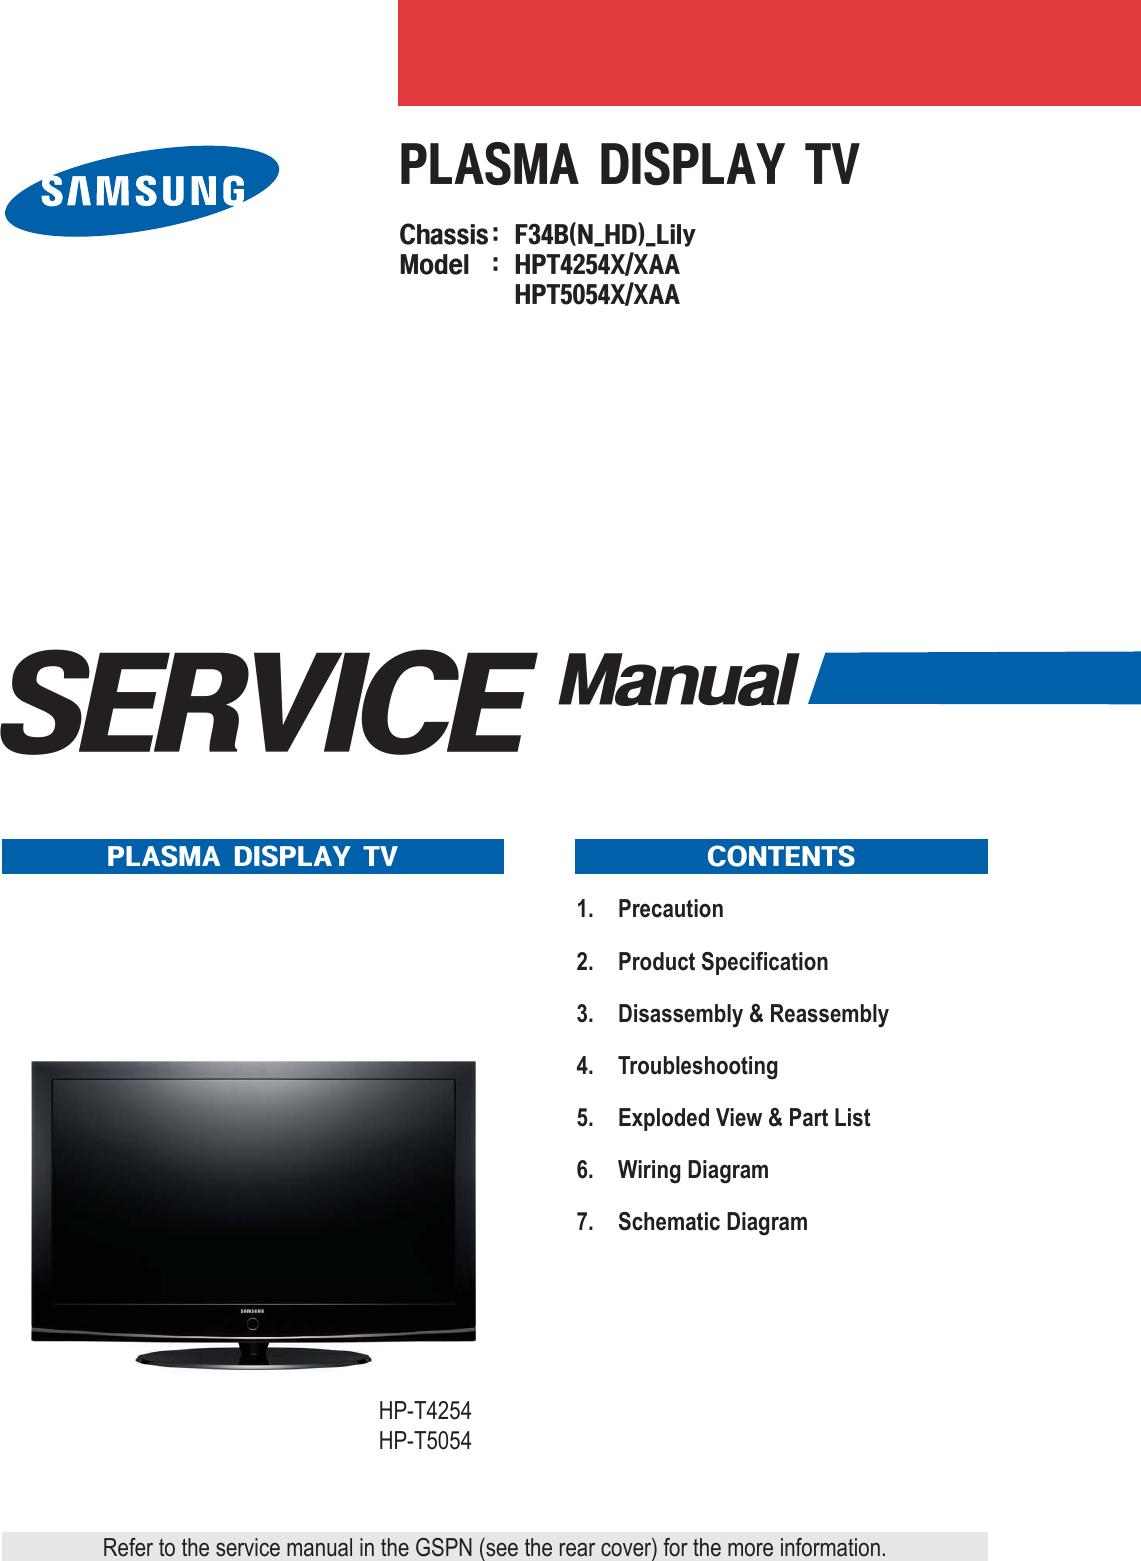 Samsung Hpt4254x Xaa Users Manual Engineering Schematics Plasma Flat Screen